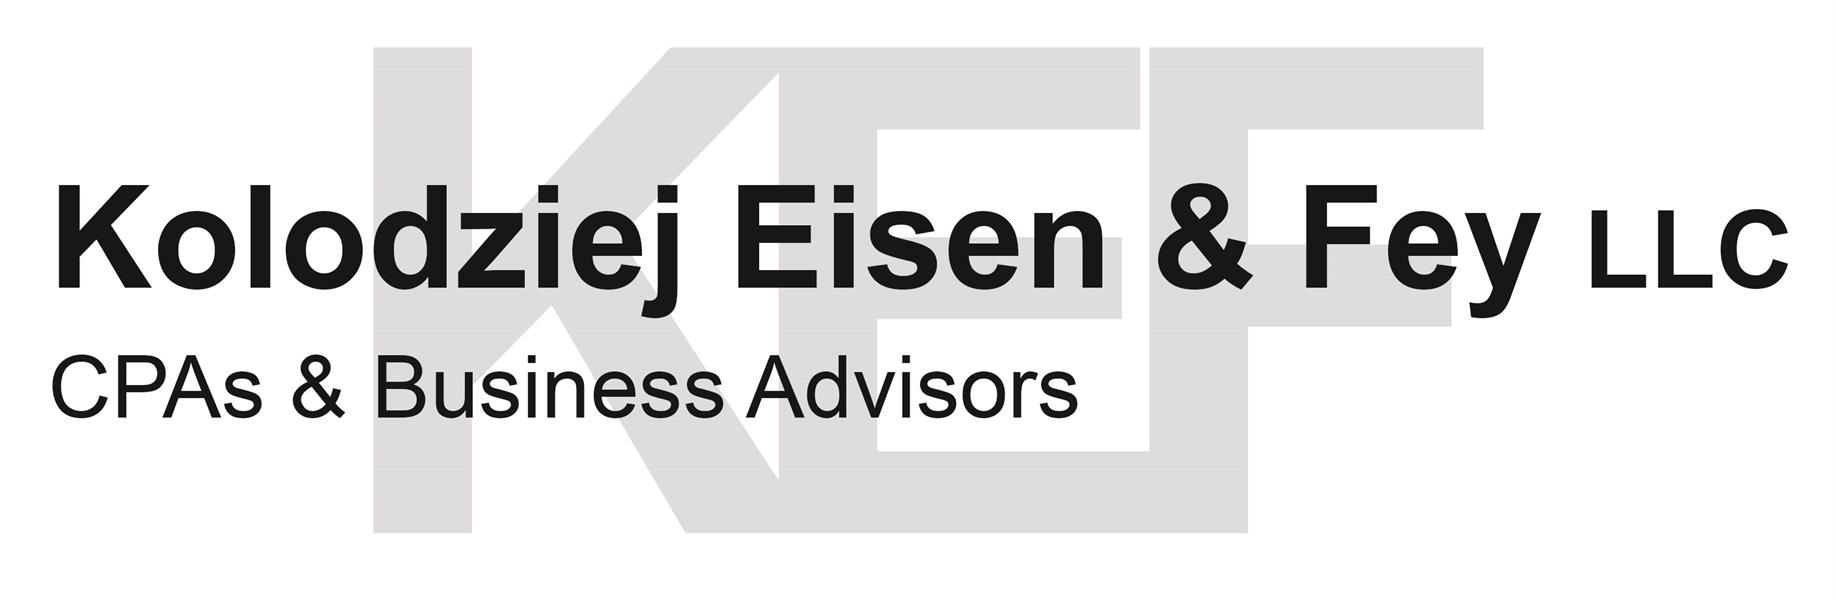 Kolodziej Eisen & Fey LLC